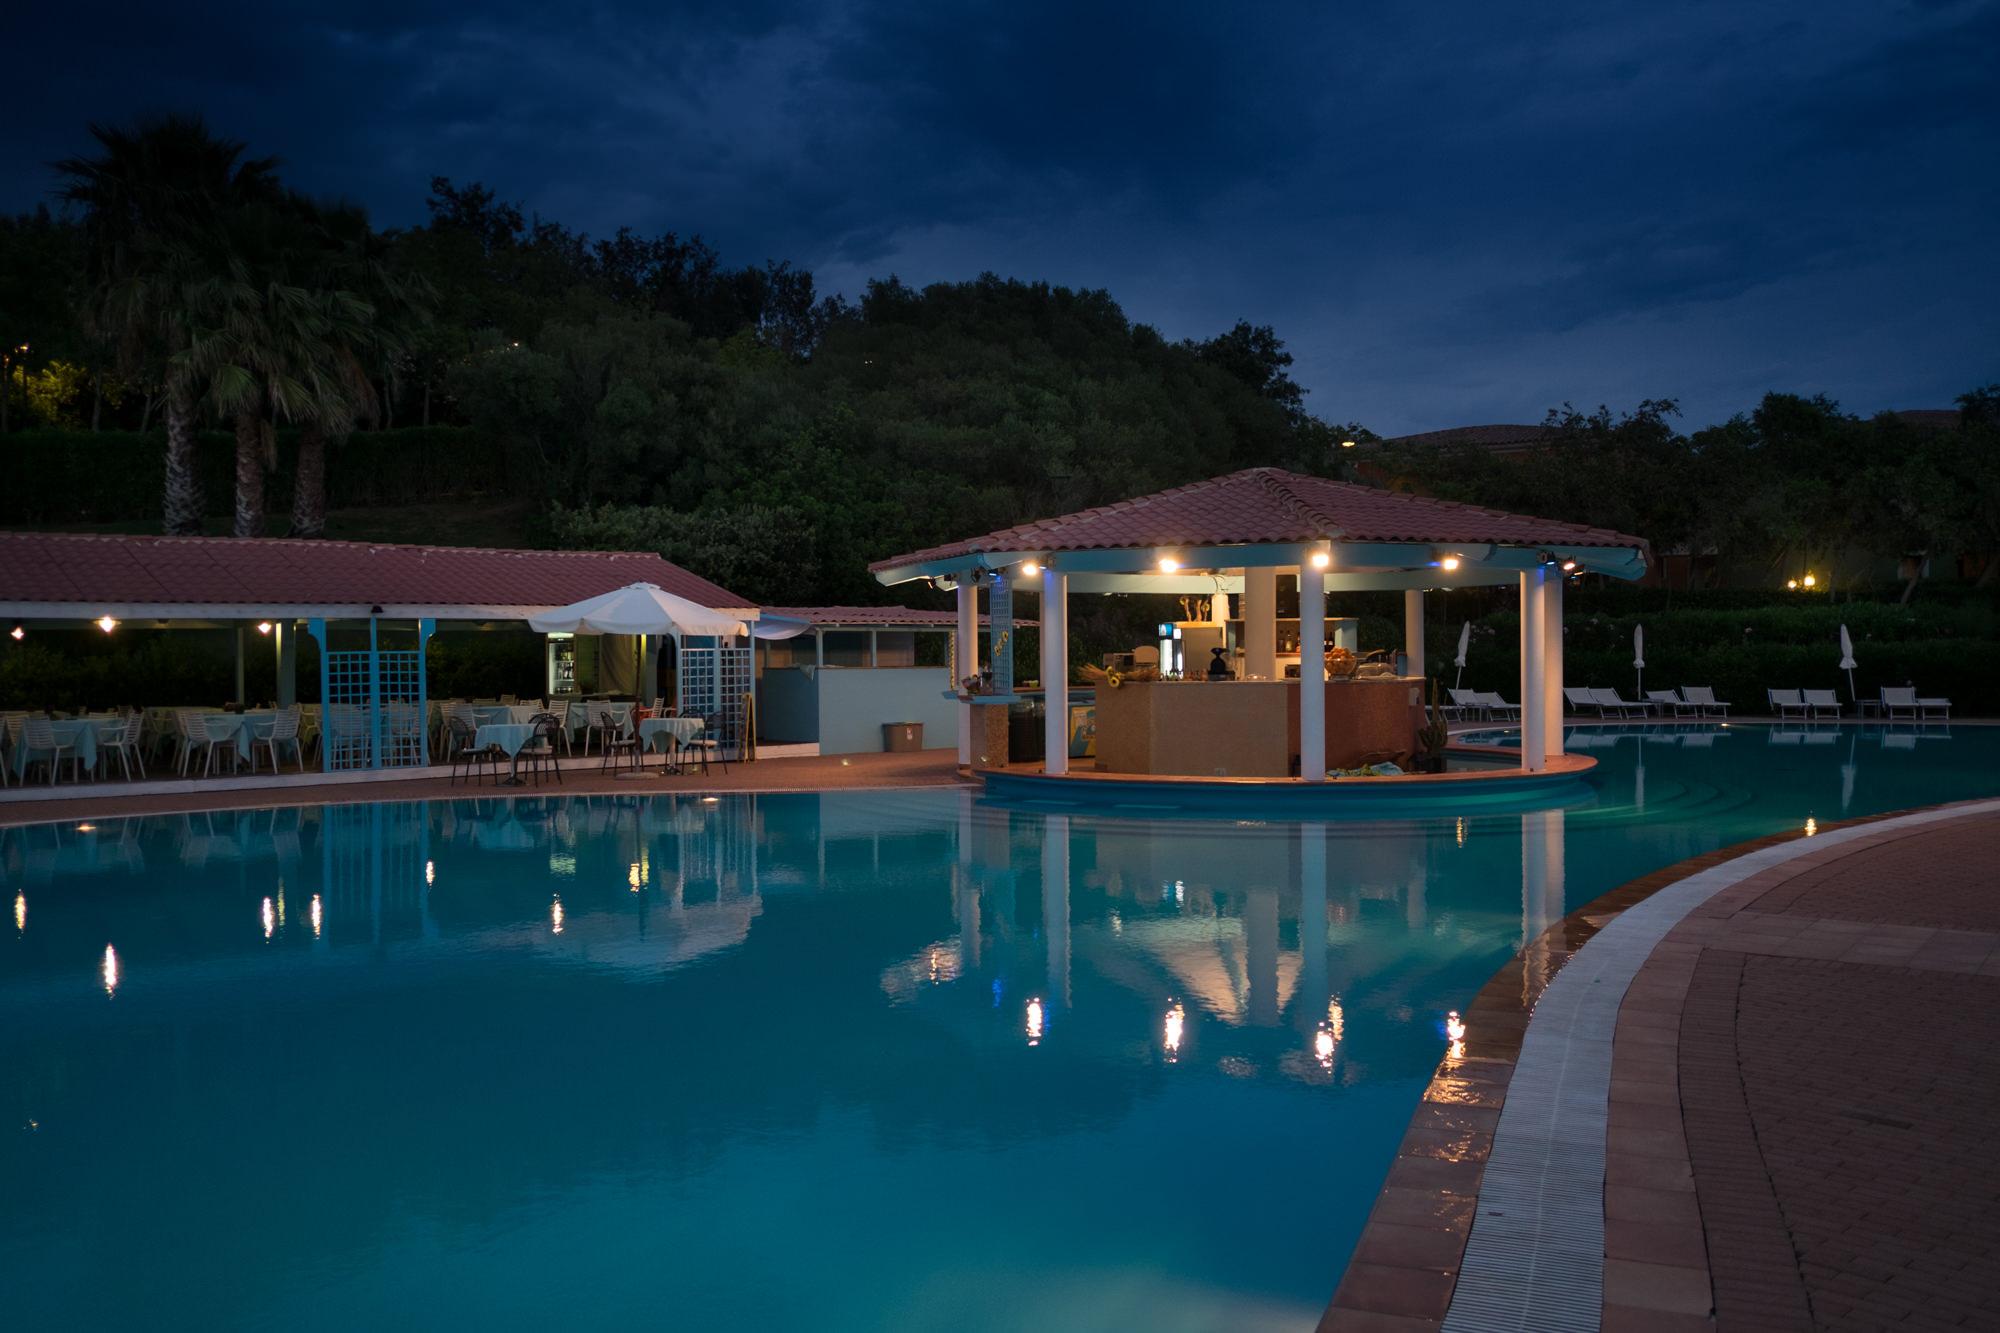 Geovillage resort sardegna pool leisure